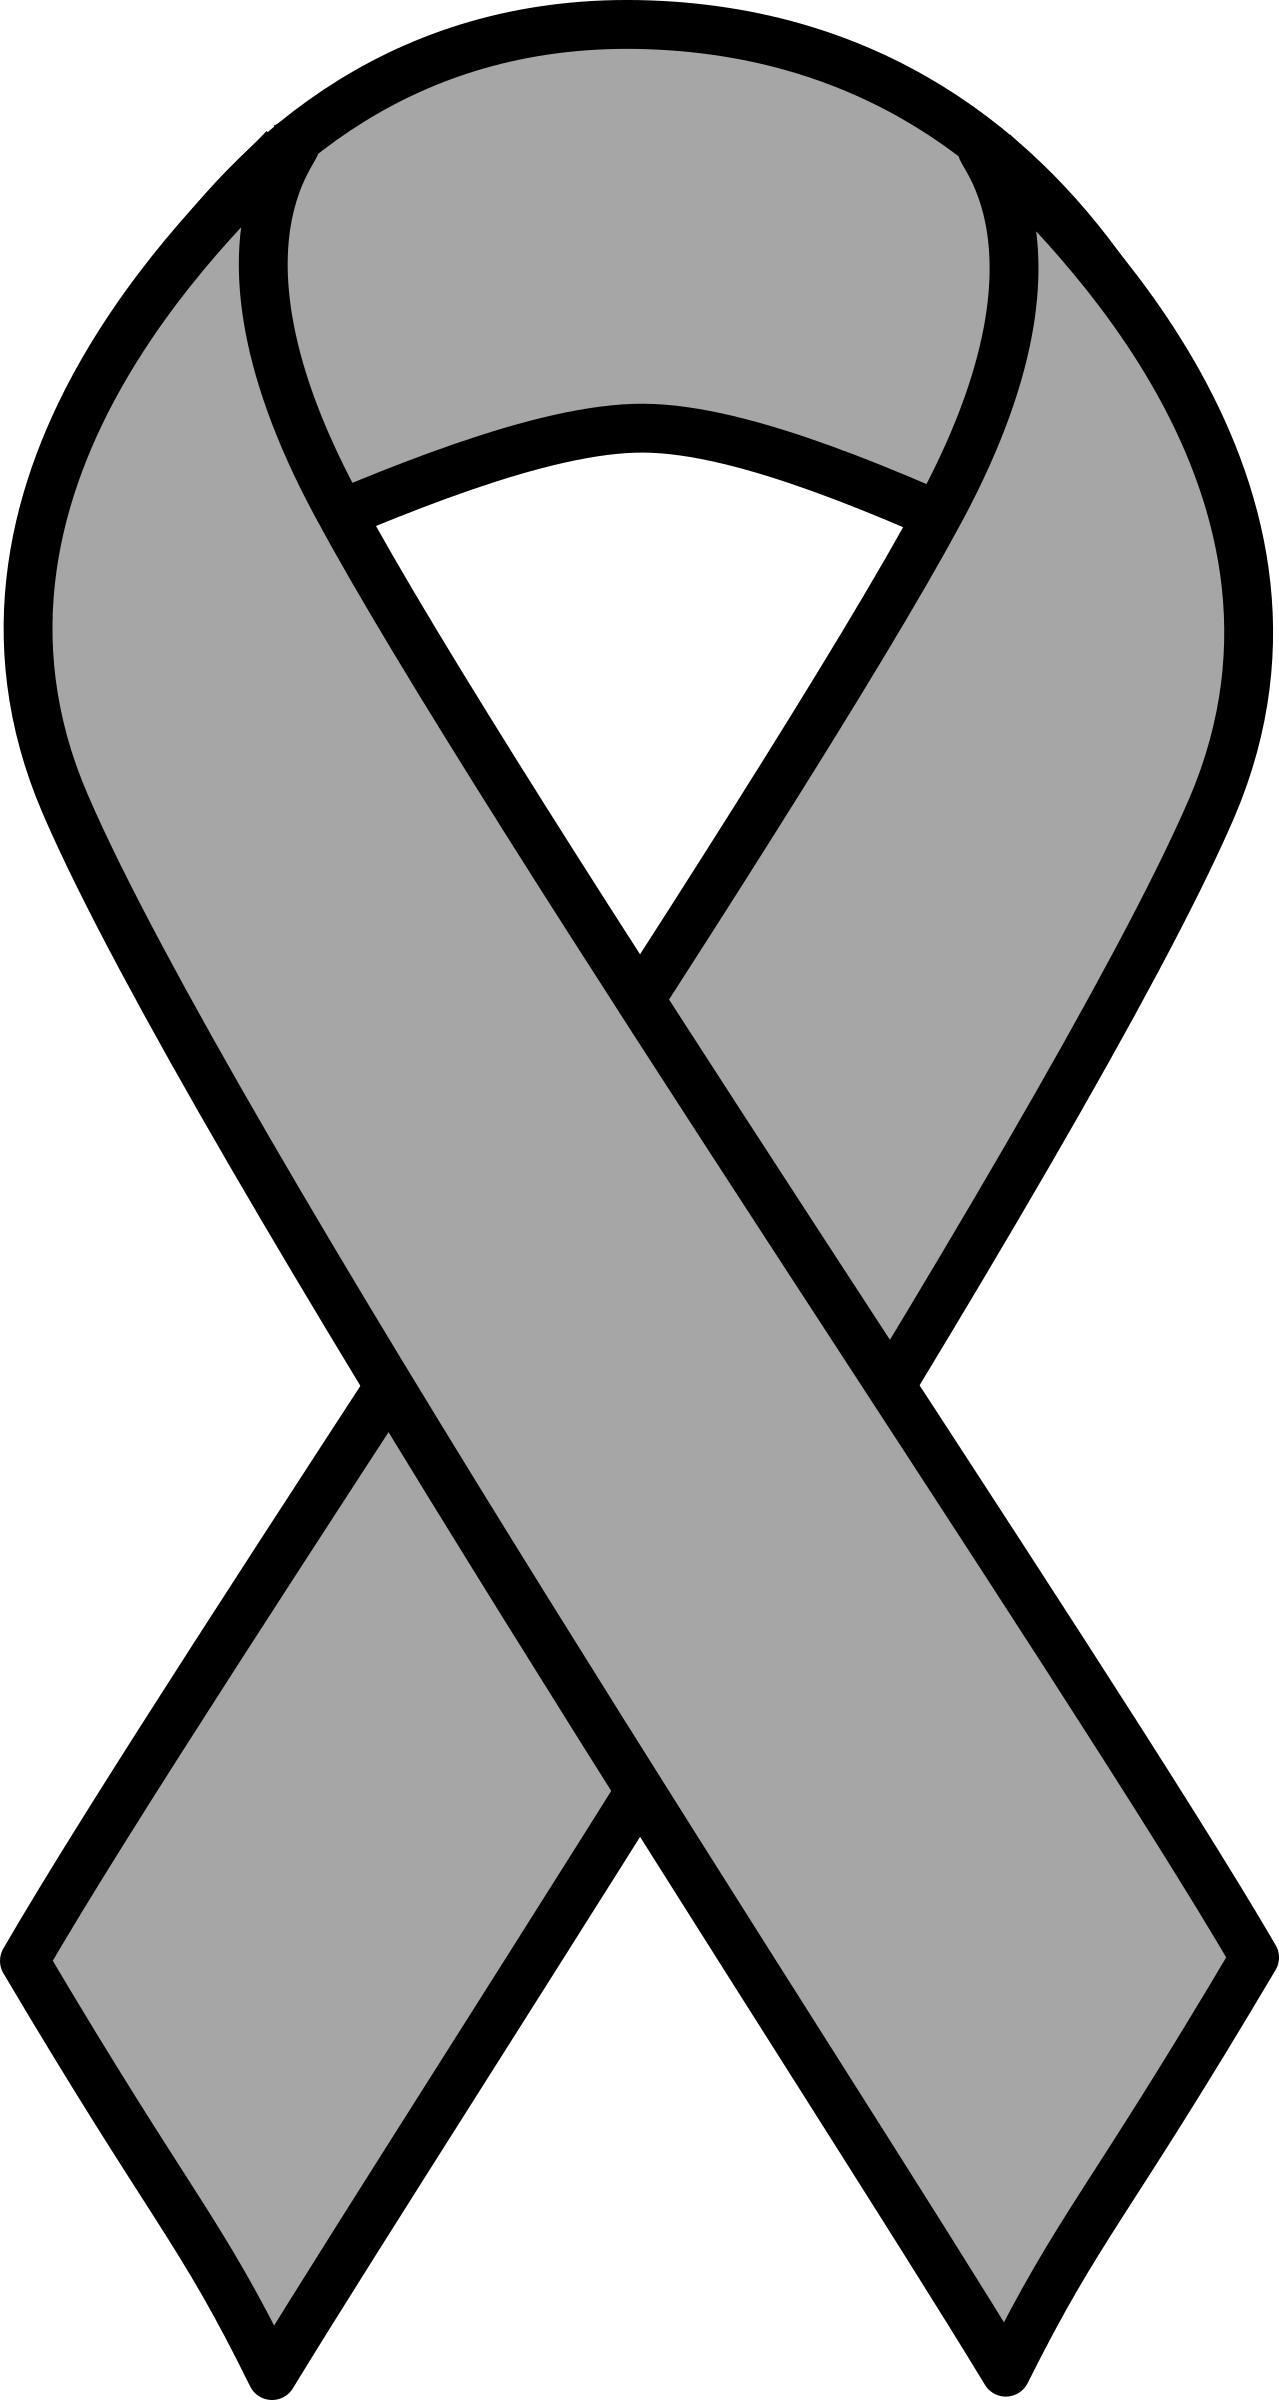 Cancer clipart black and white. Orange kidney leukemia ribbon